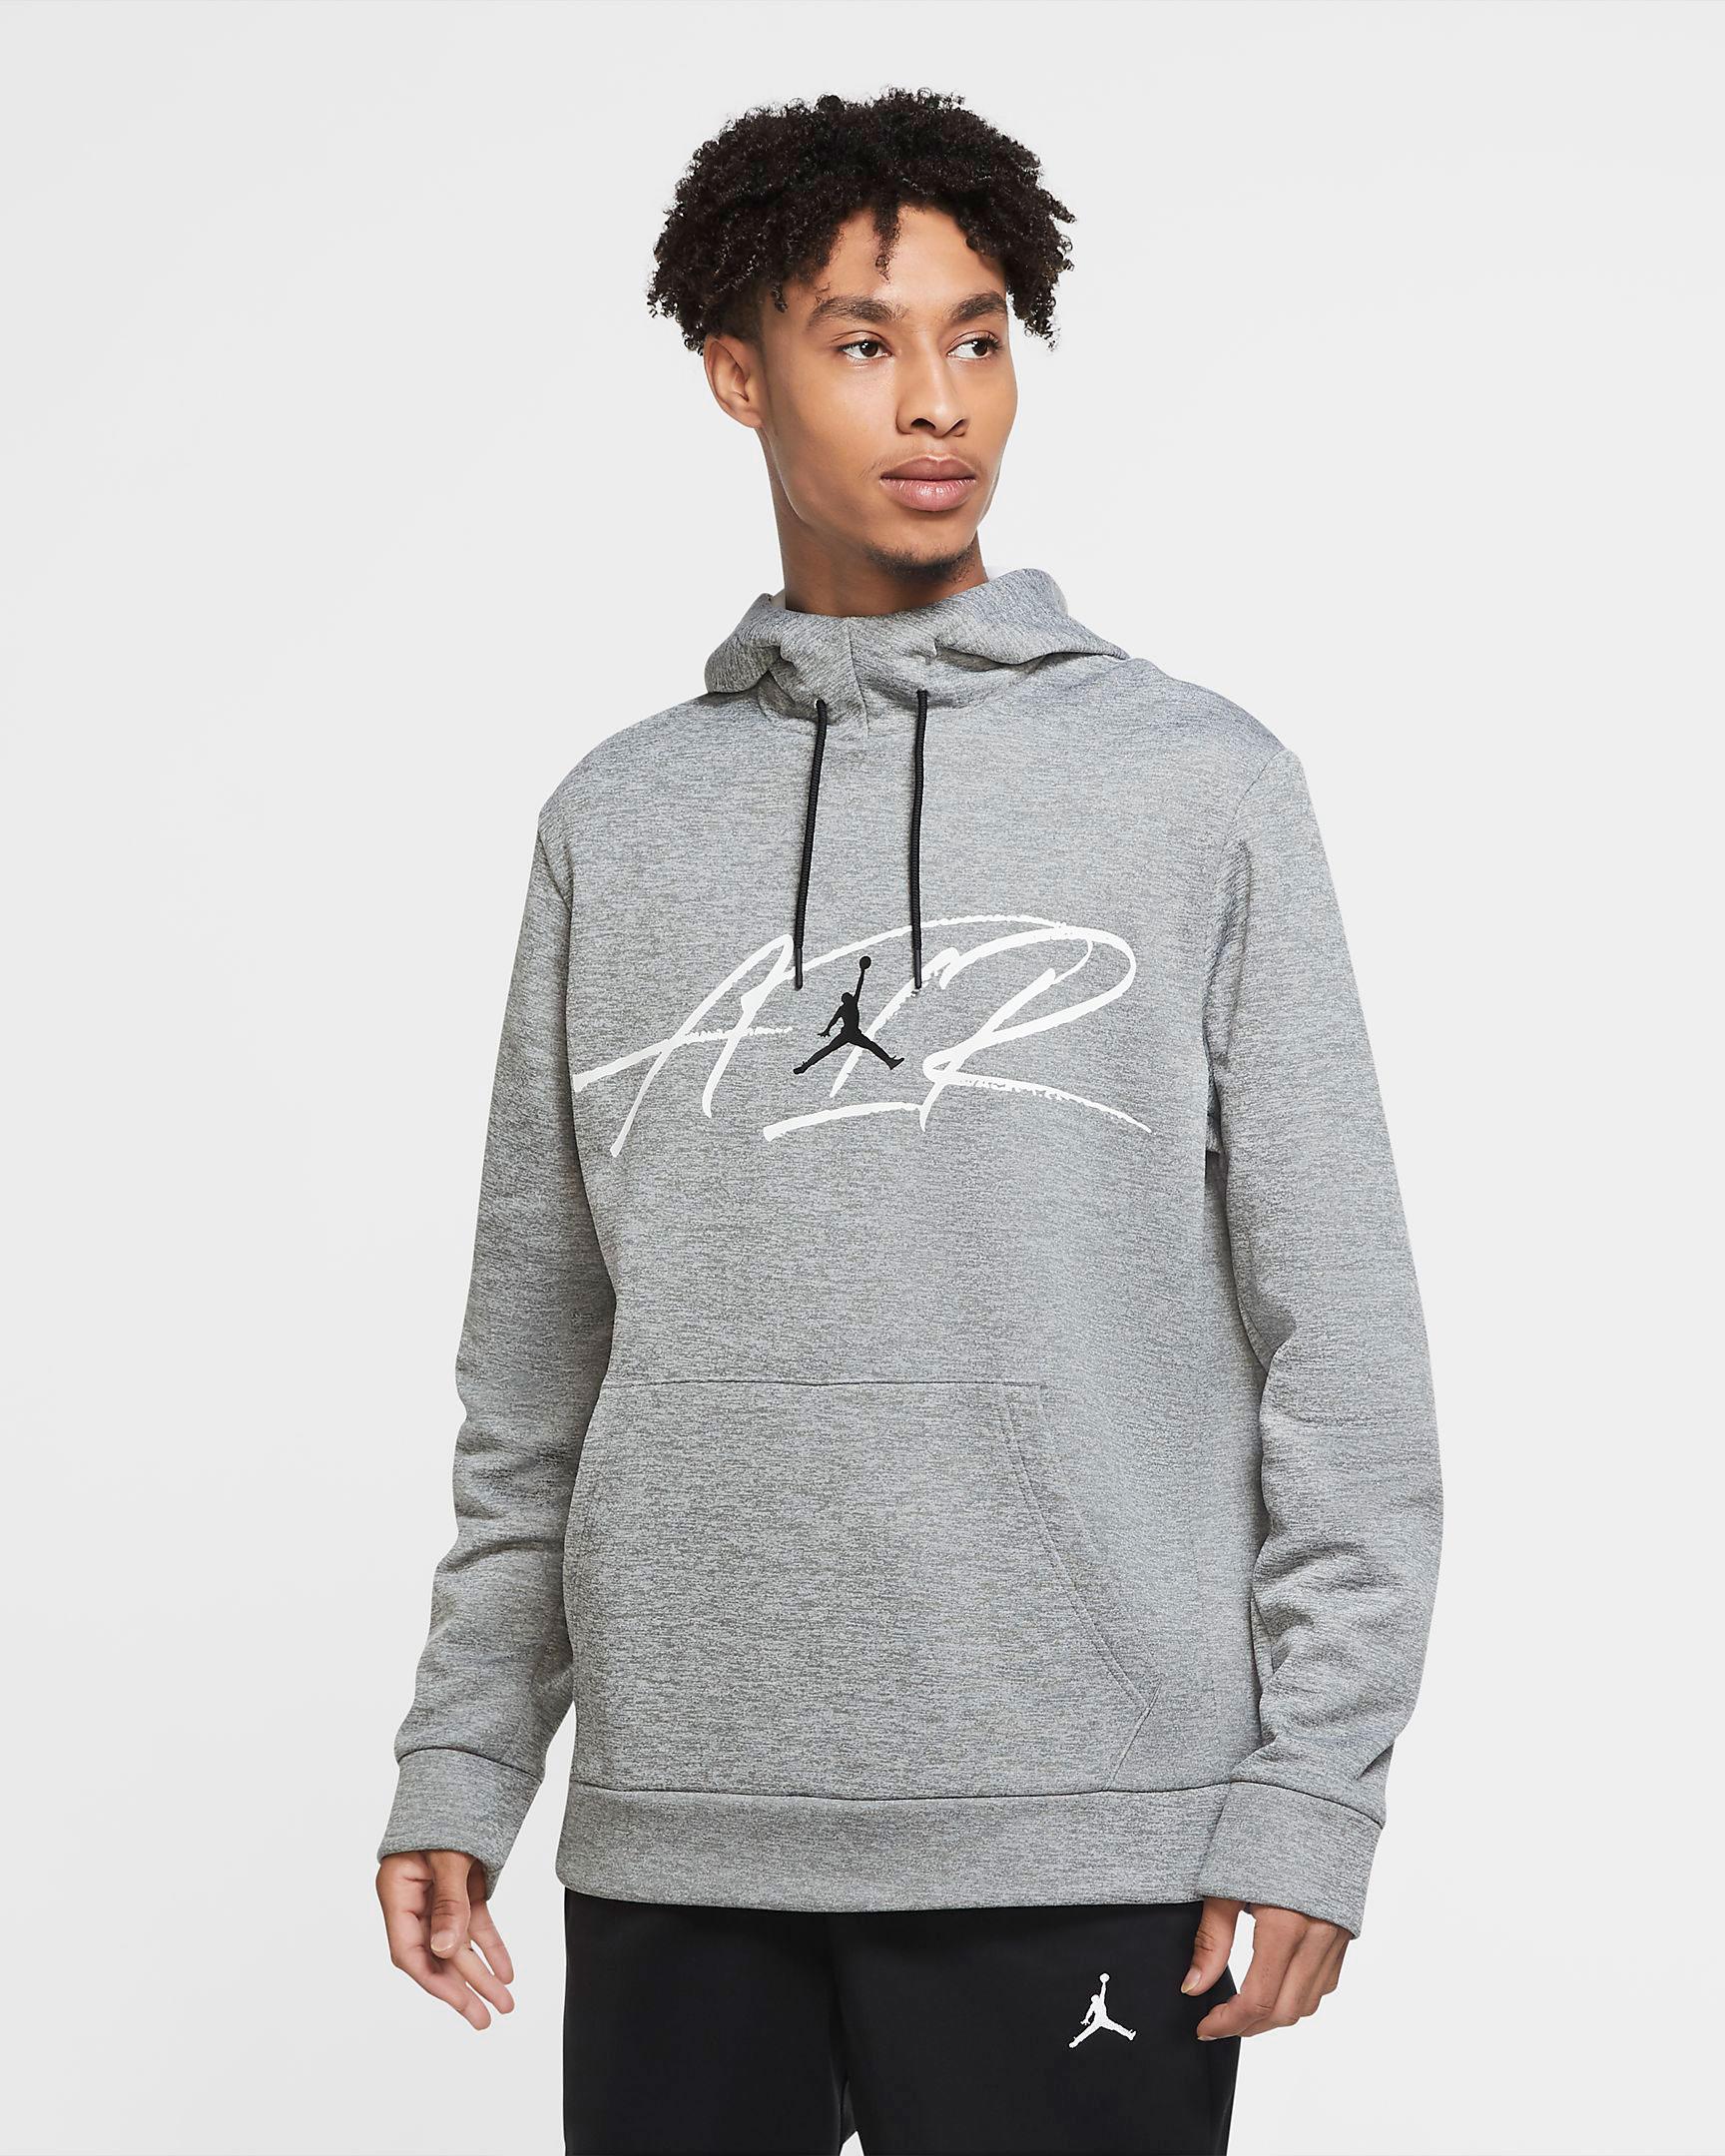 jordan-air-therma-cement-grey-hoodie